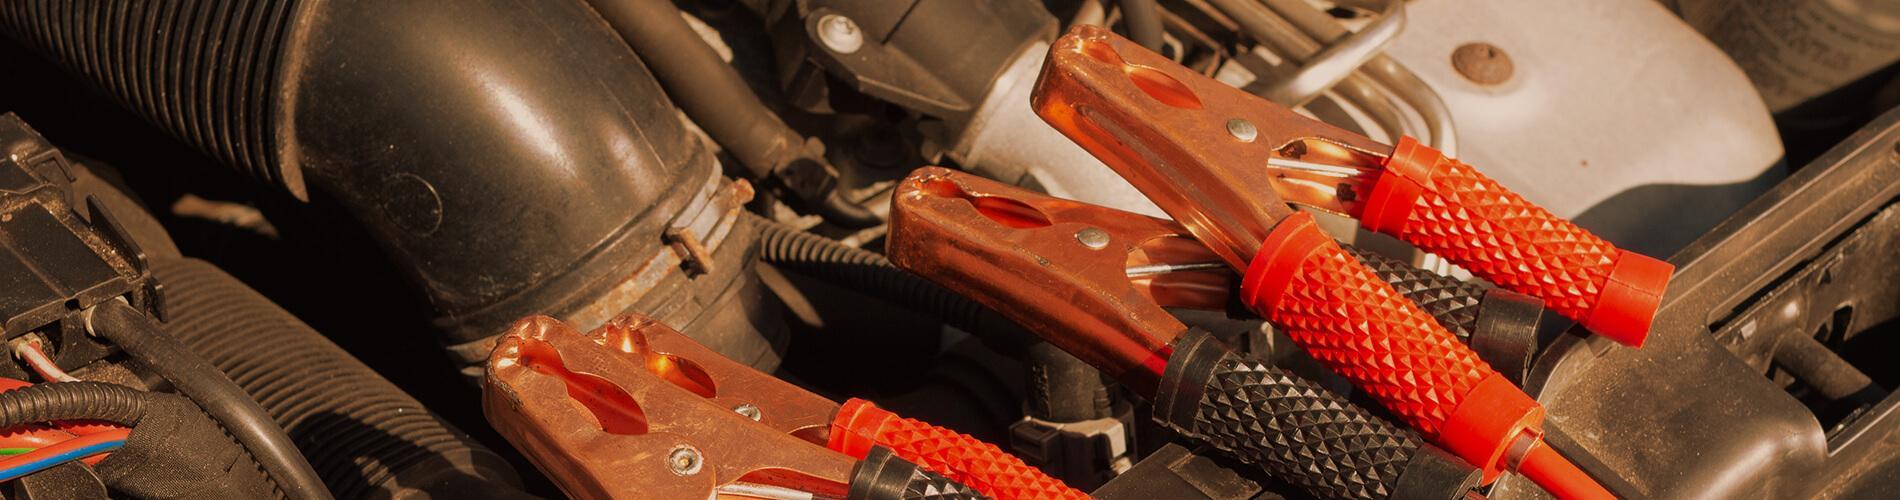 Car Batteries Brisbane